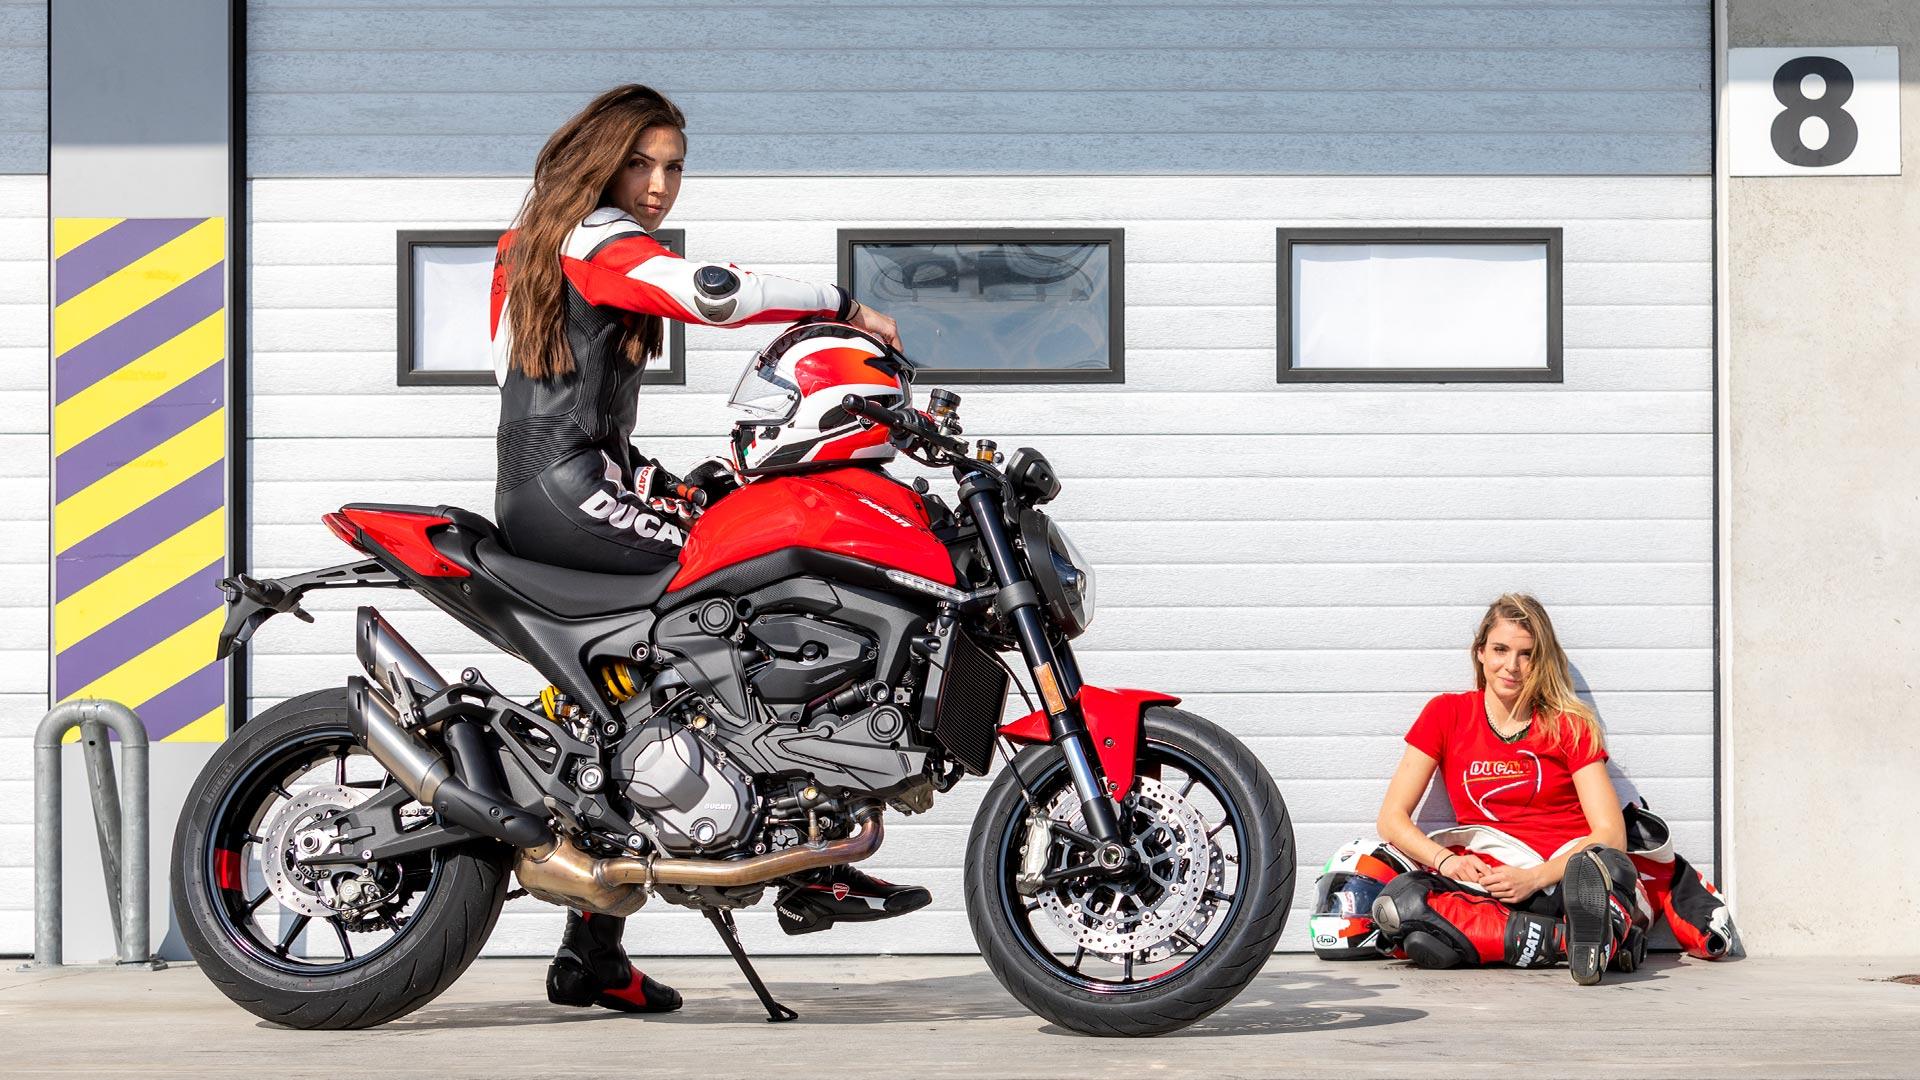 Ducati Monster Rear Brake Hose Recall